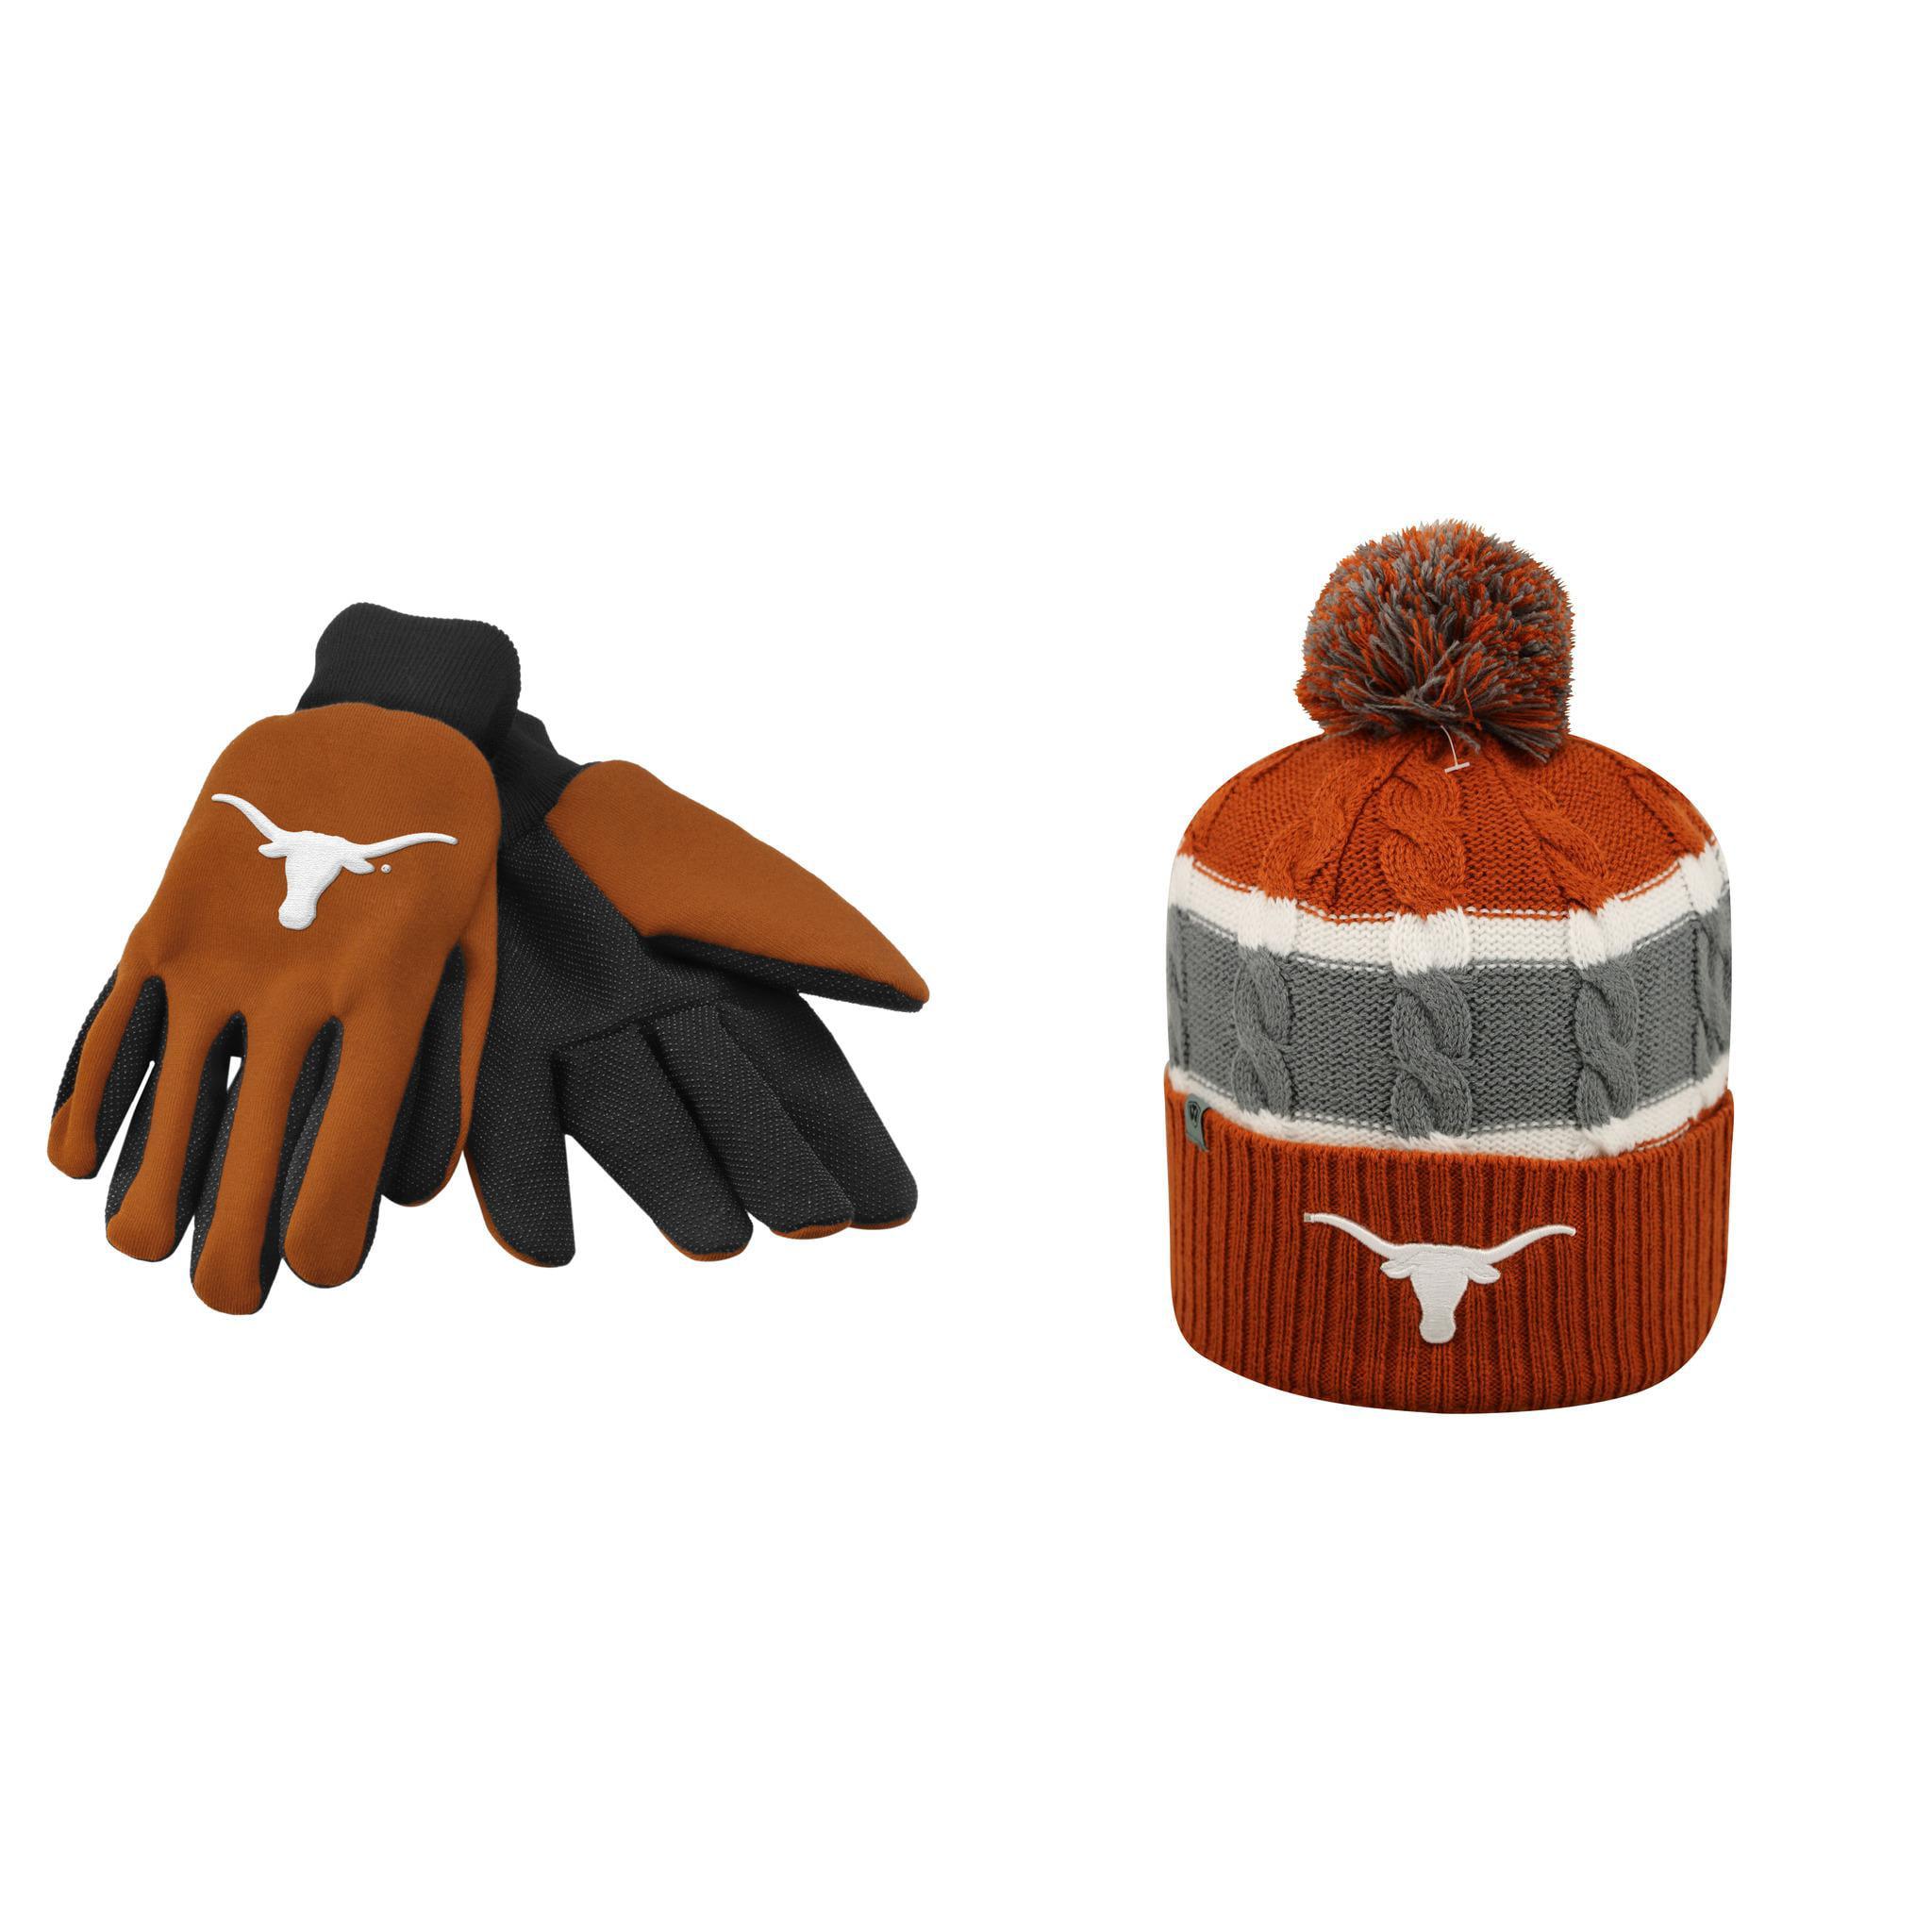 NCAA Texas Longhorns Grip Work Glove And Windy Beanie Hat 2 Pack Bundle